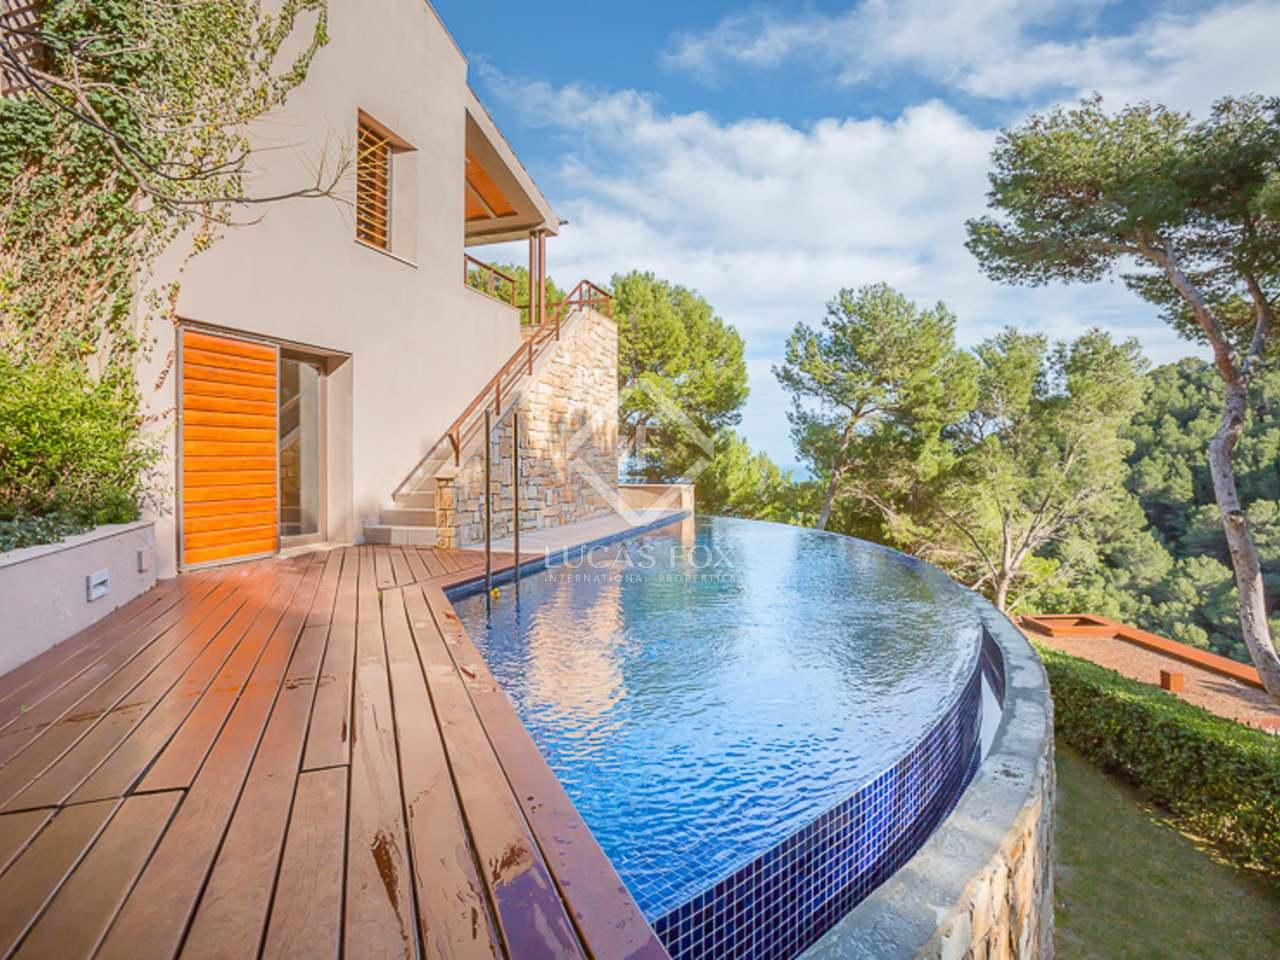 Villa moderna con toques r sticos en venta en begur for Piscinas naturales begur